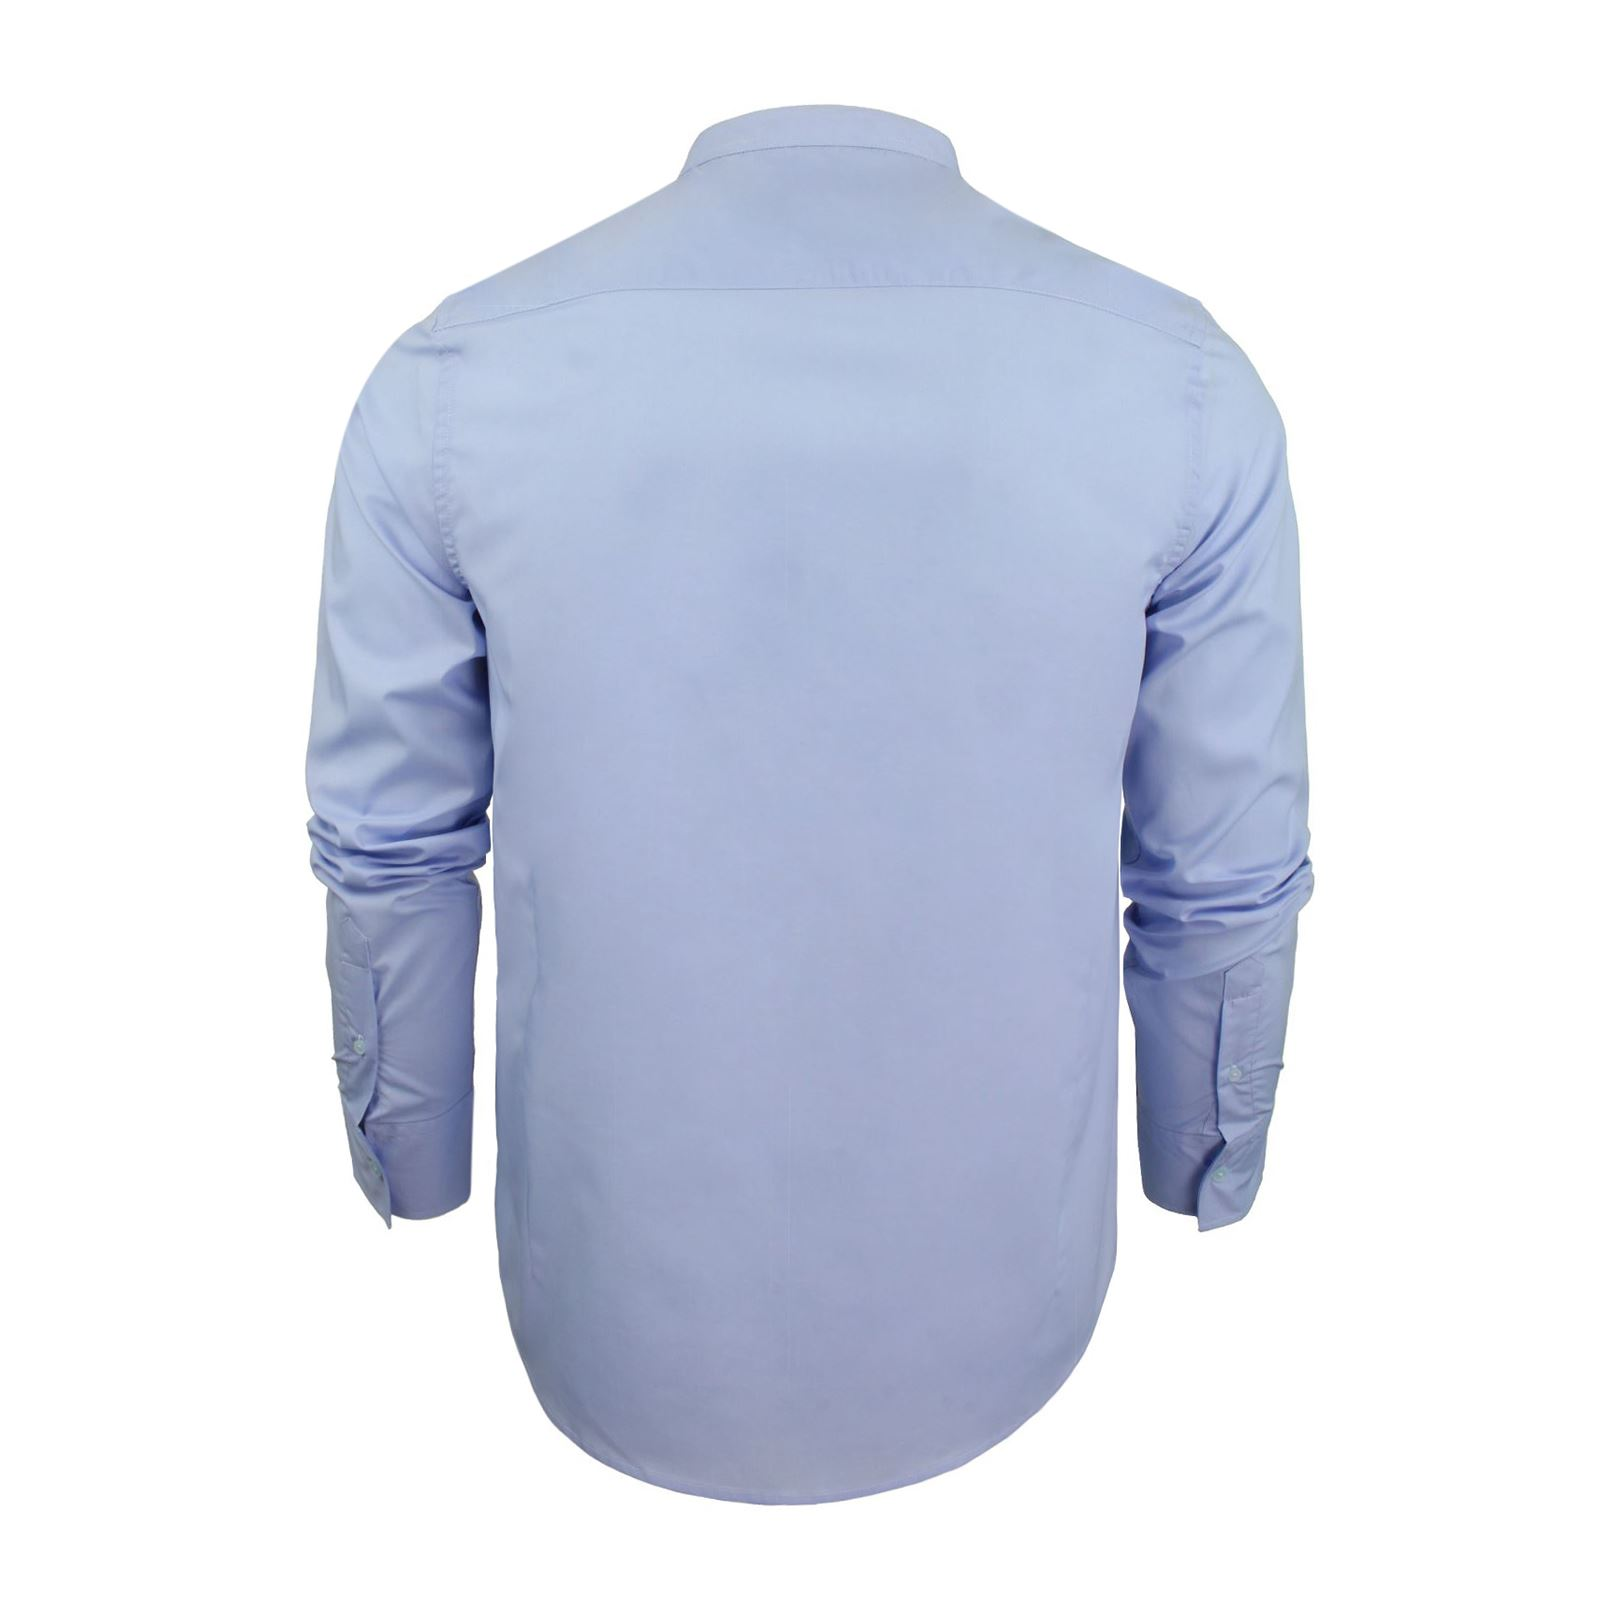 Mens-Shirt-Brave-Soul-Magnus-Plain-Grandad-Collar-Long-Sleeve-Casual-Top thumbnail 7